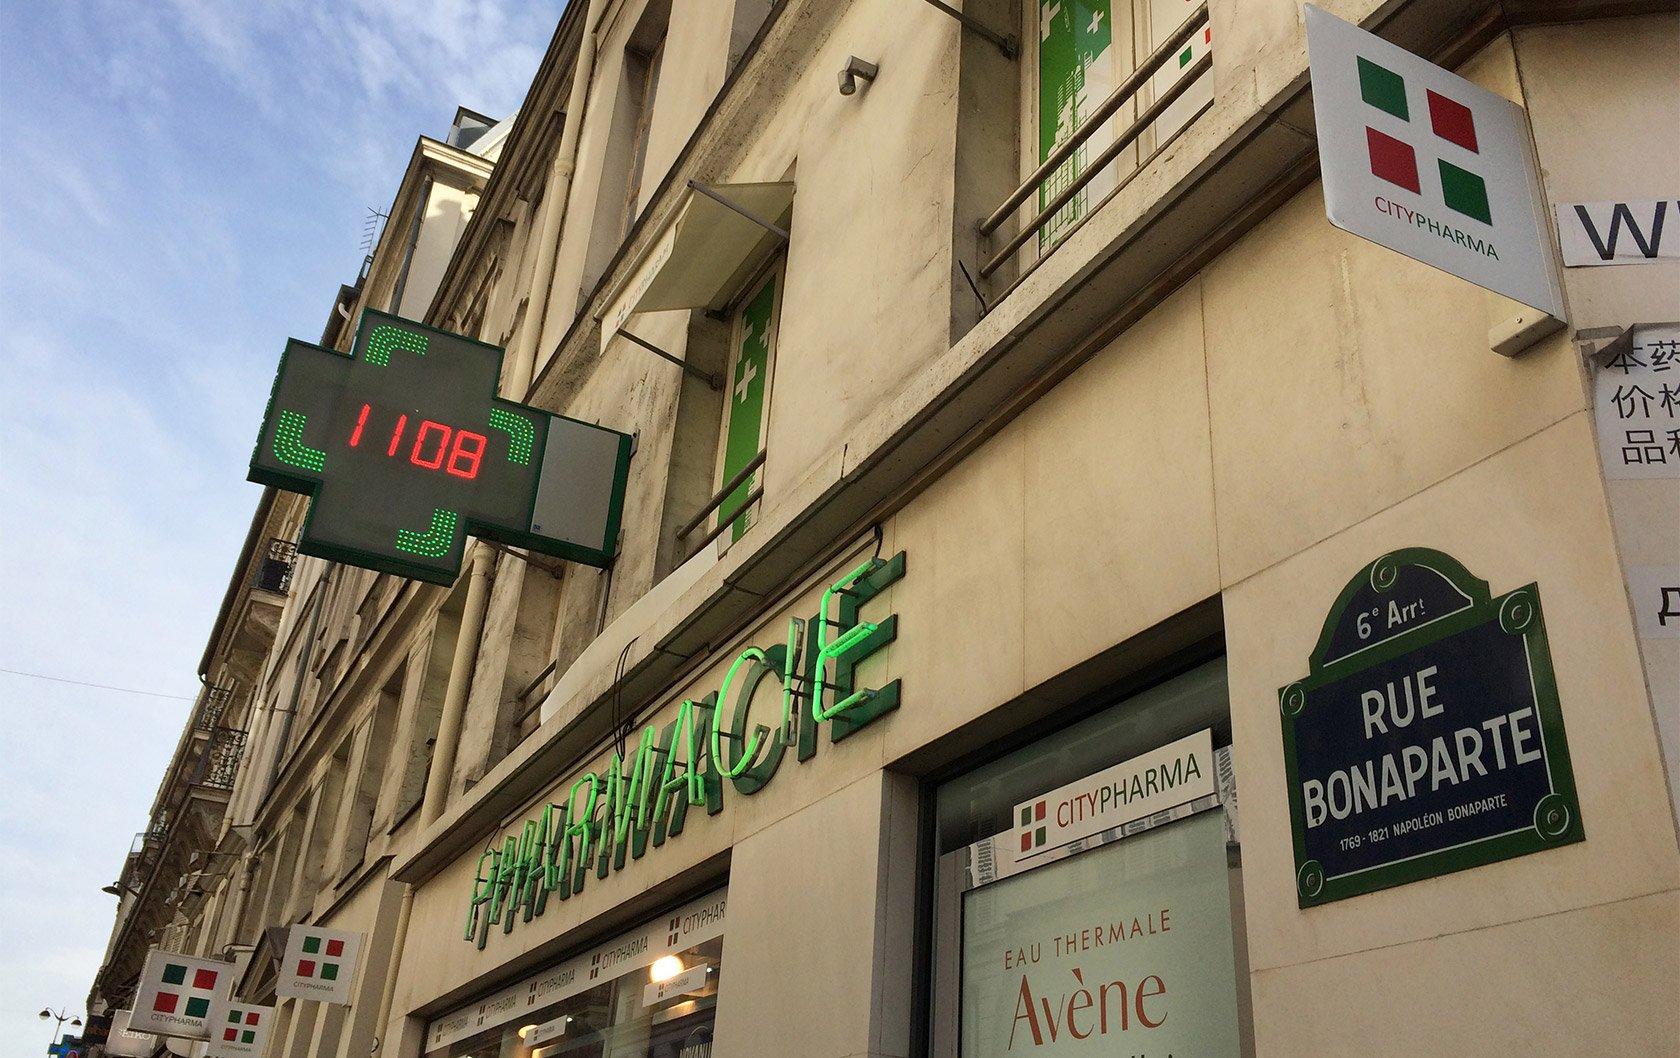 city-pharma-rue-bonaparte